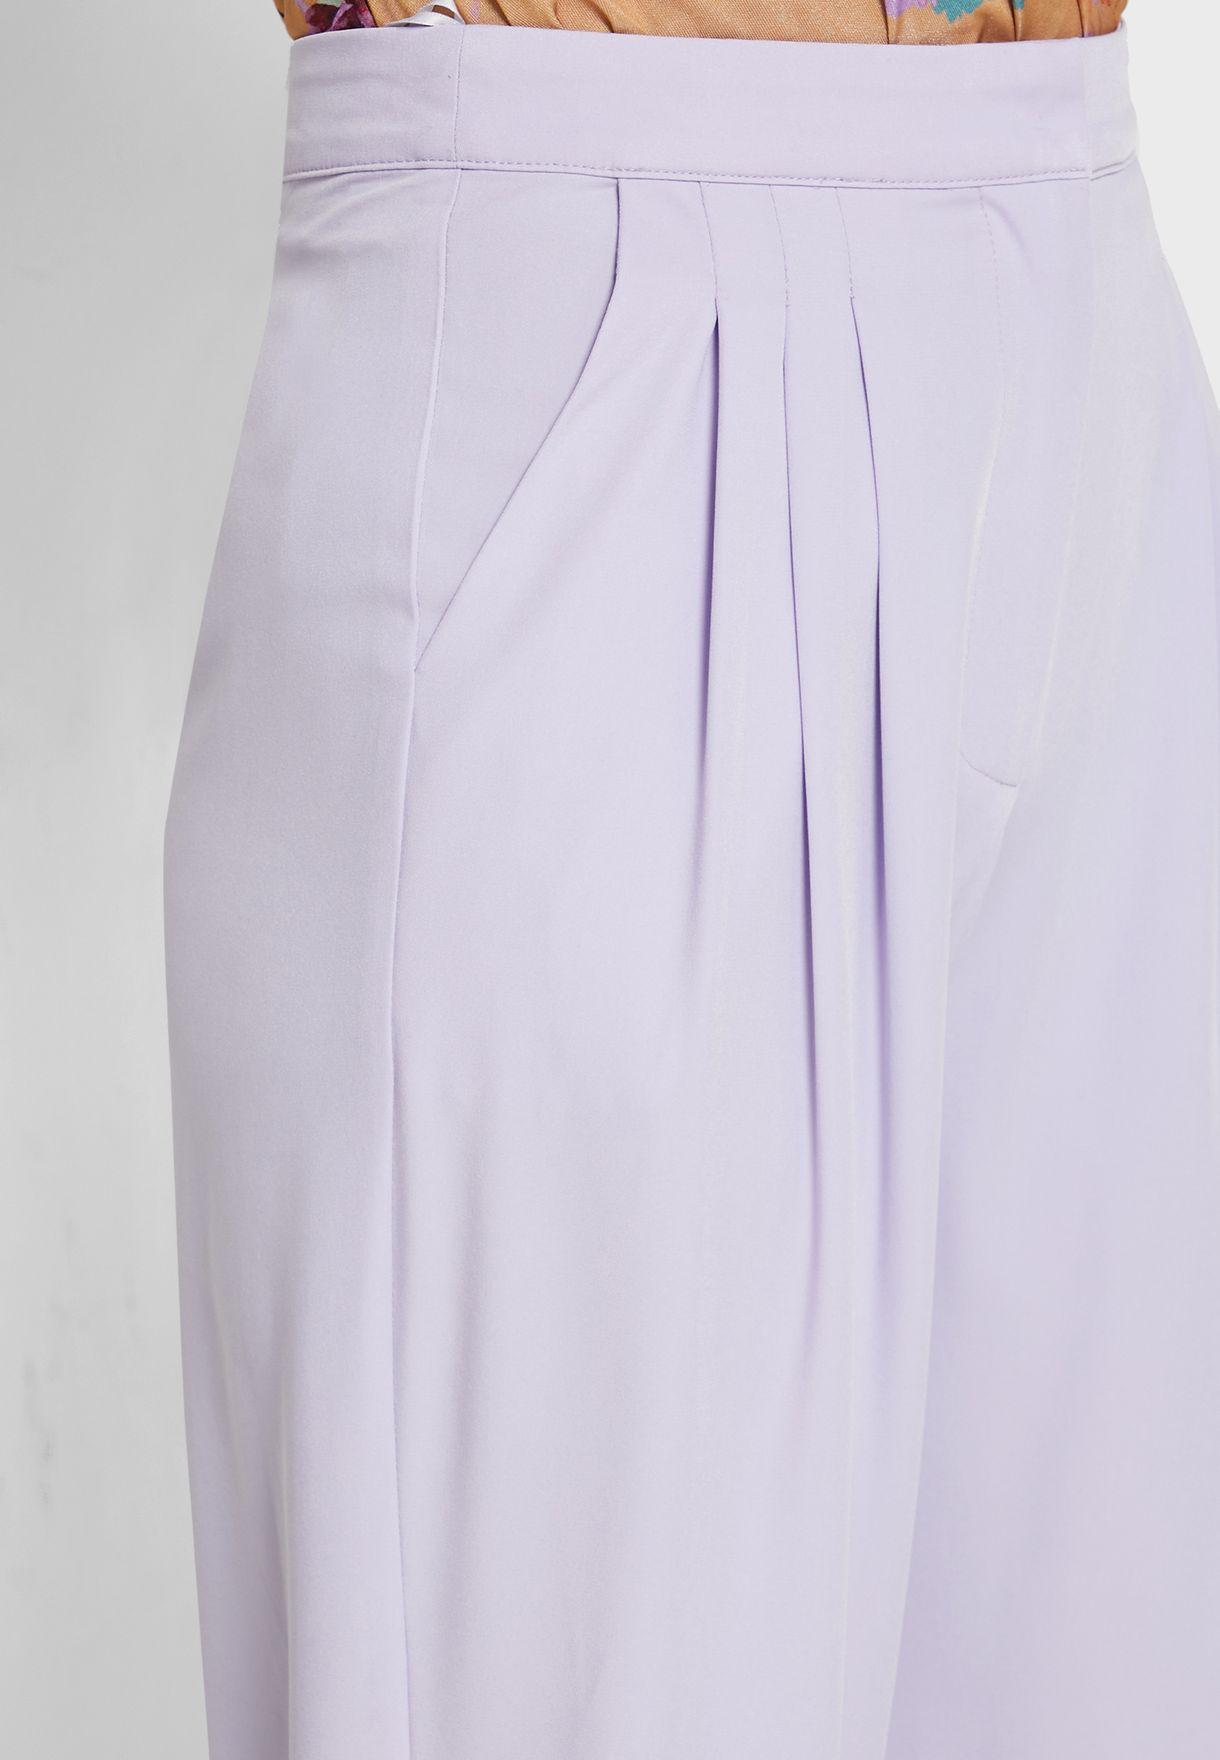 Folded Cuffed Pants